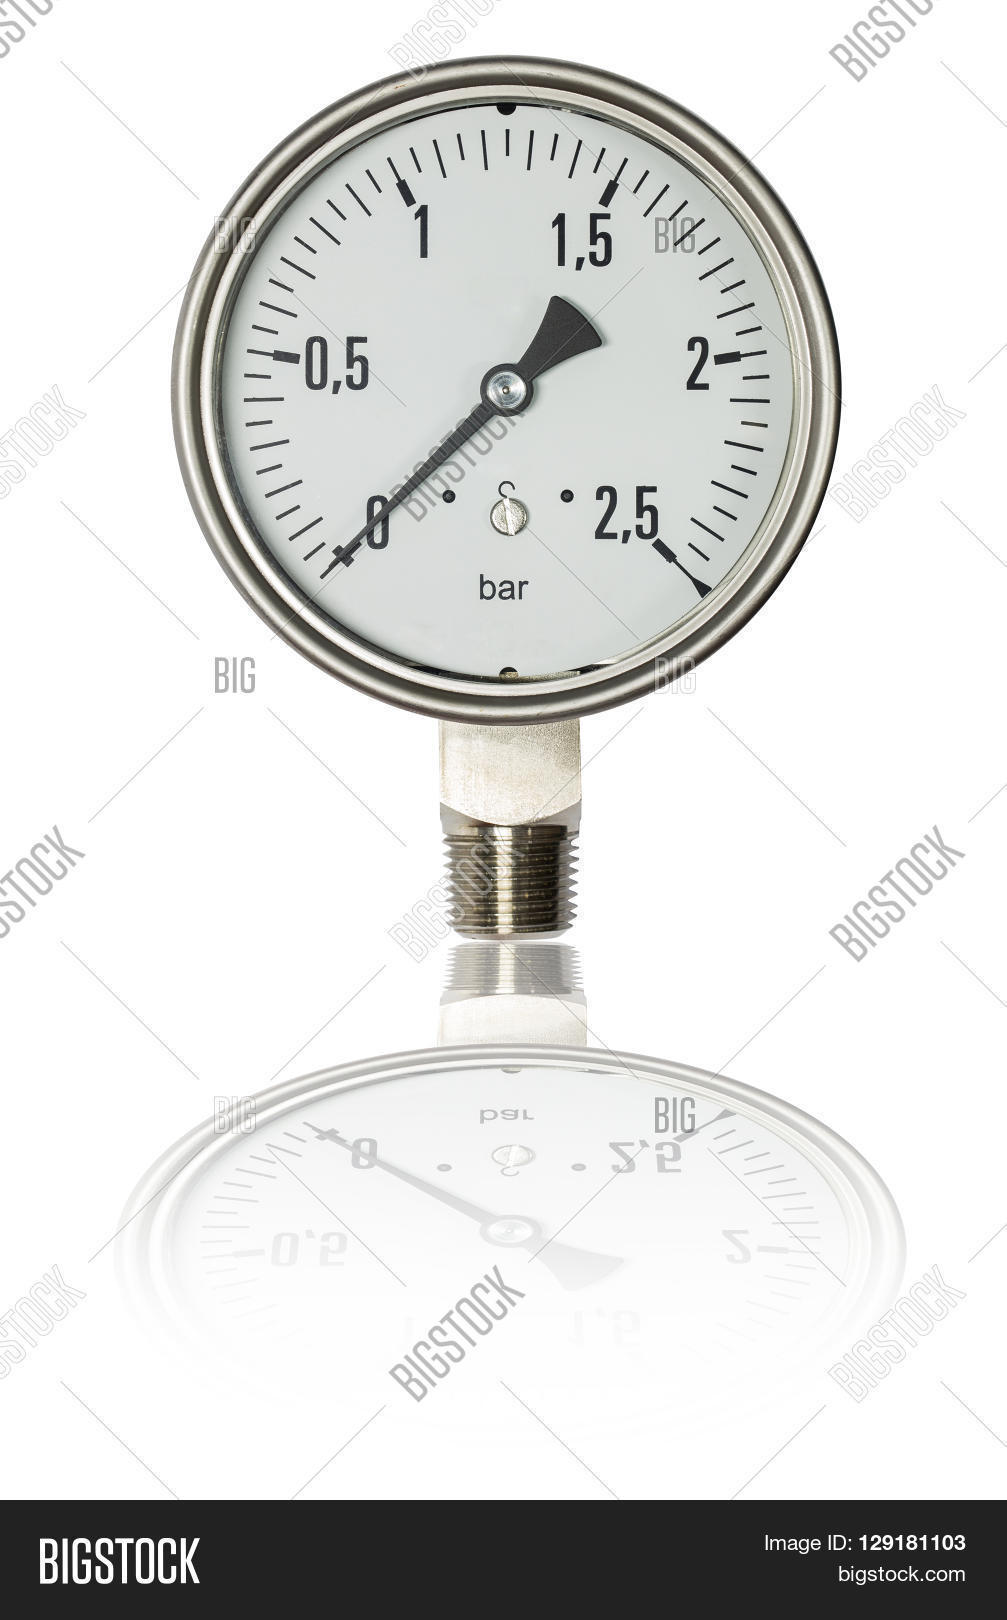 Pressure Gauge Bourdon Image & Photo (Free Trial) | Bigstock